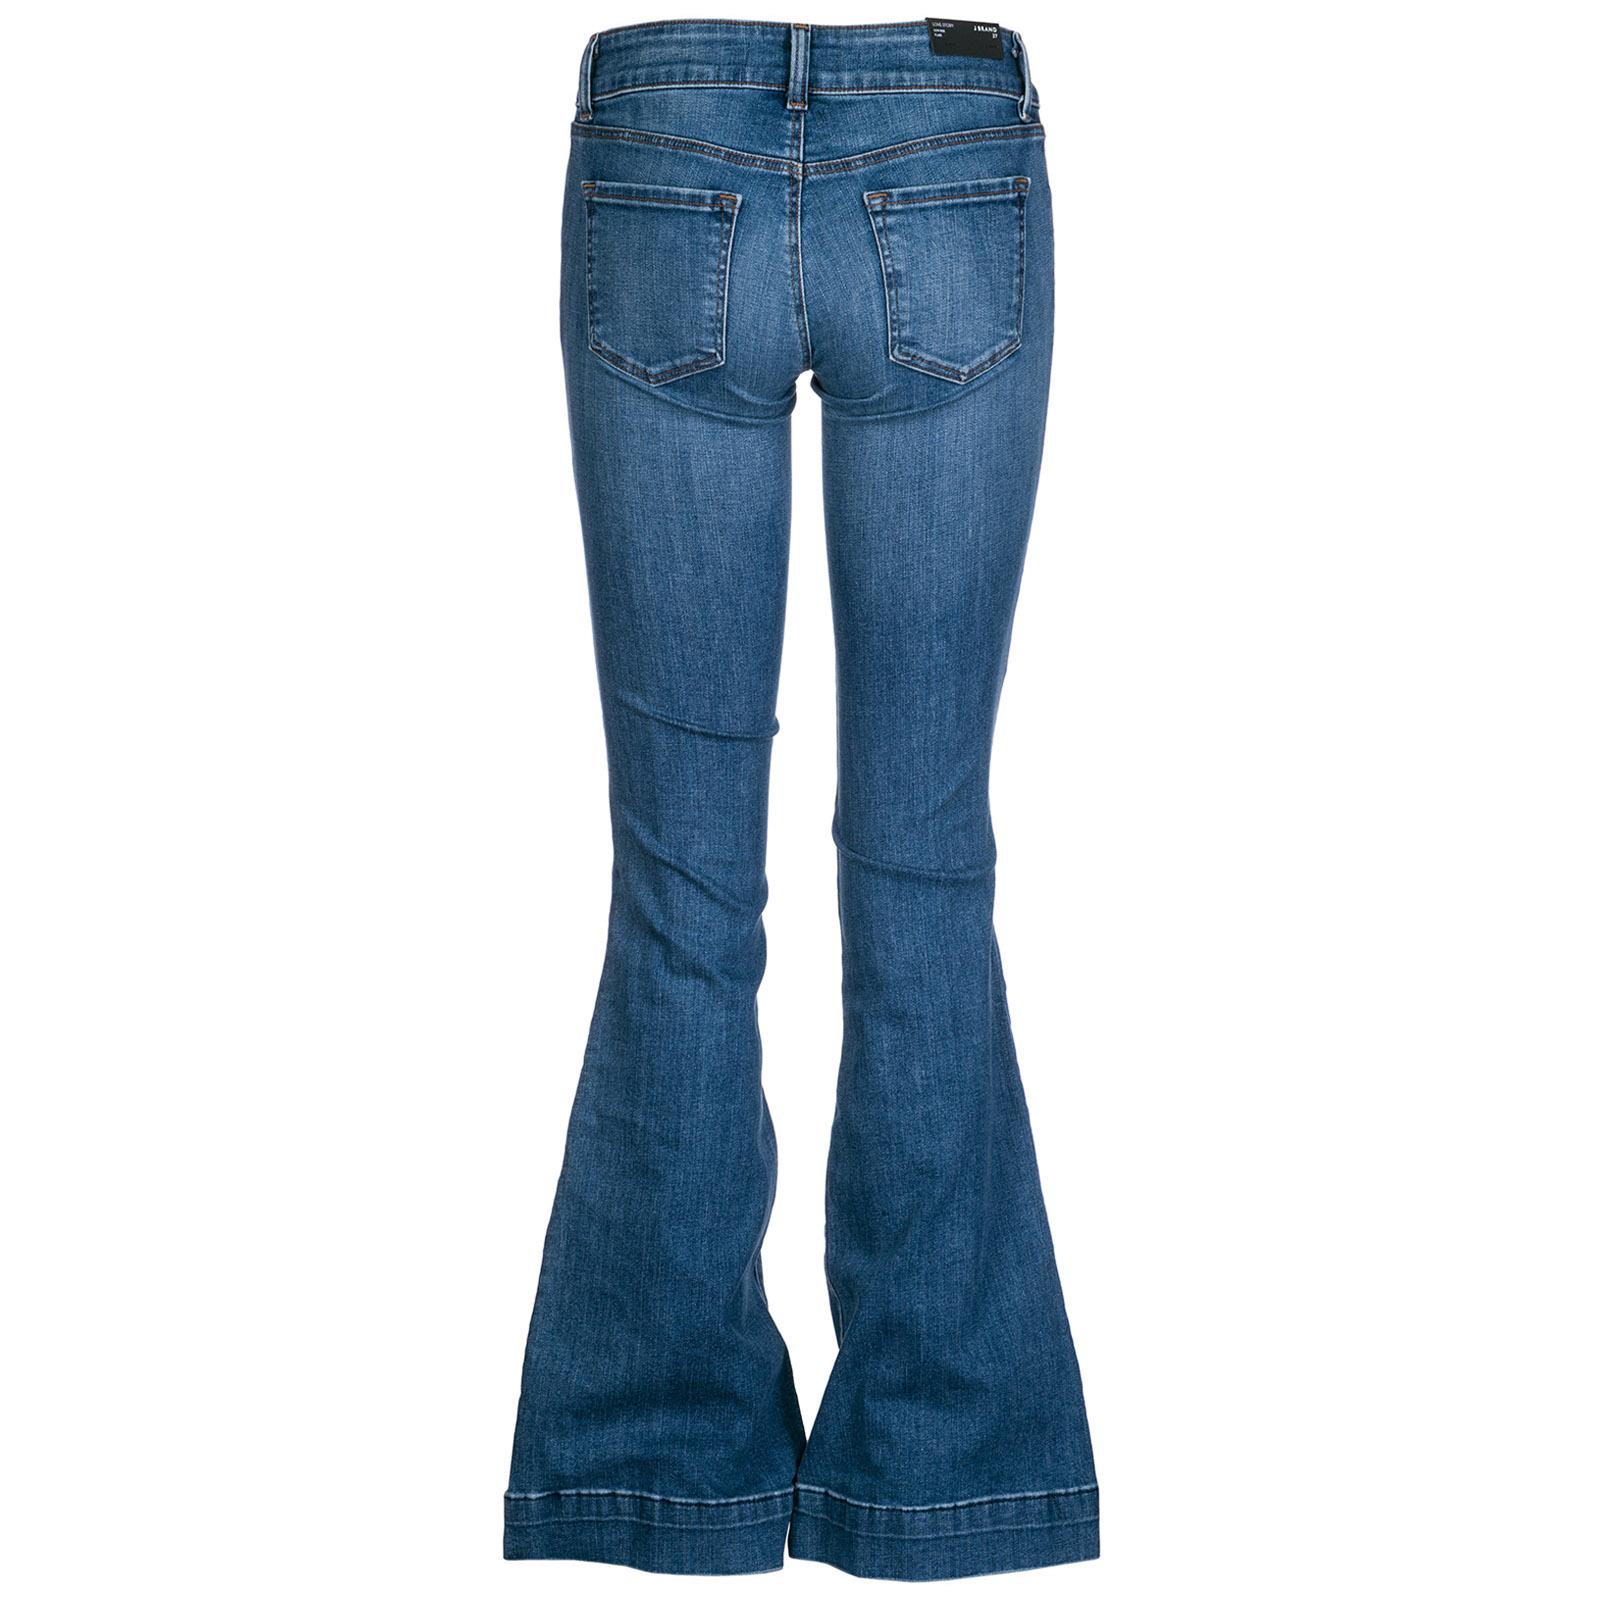 77827433755 ... Jeans de campana flare de mujer love story